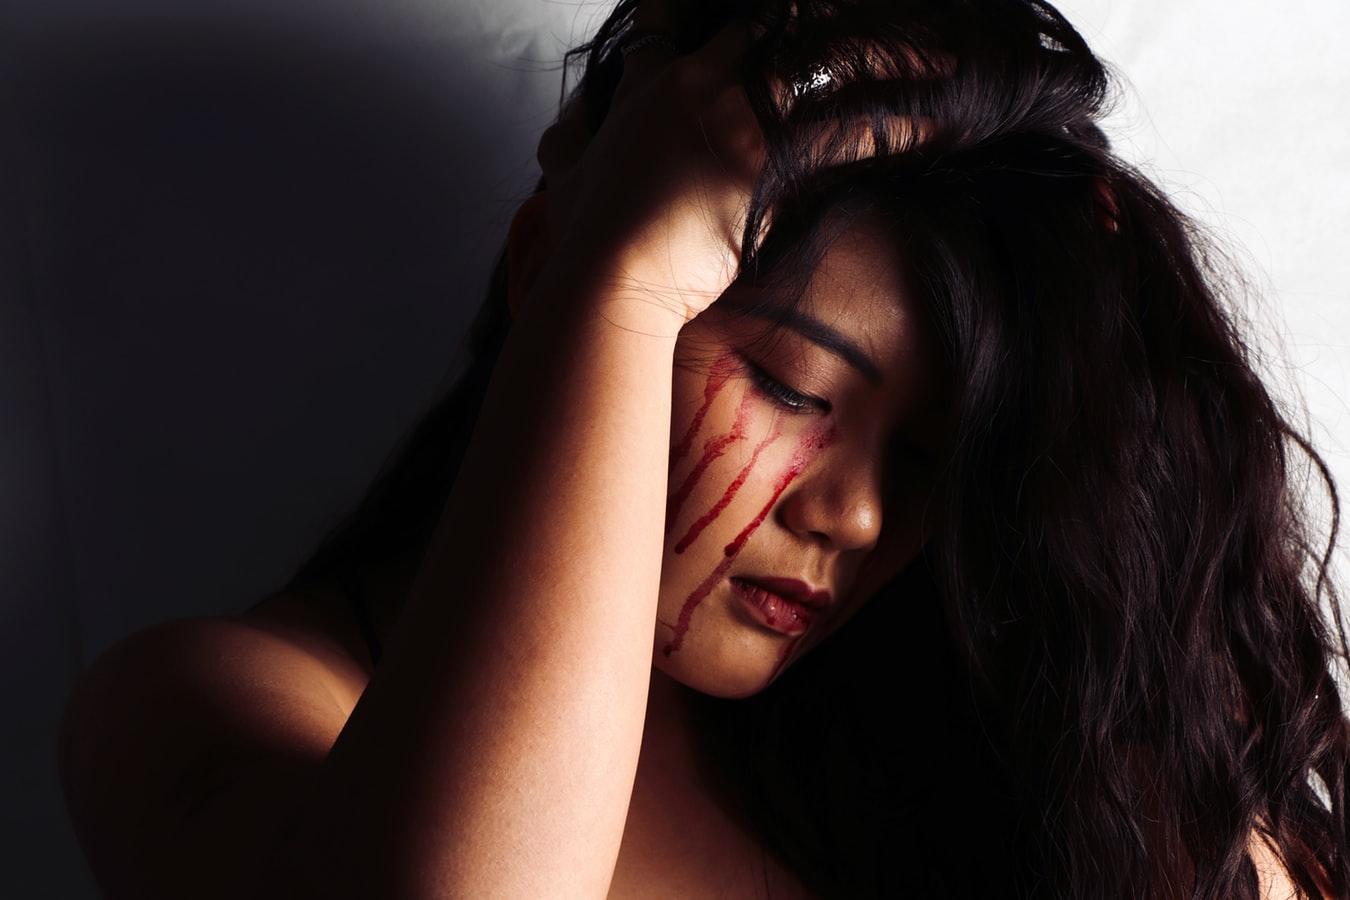 FRANCE: Violences Conjugales – Un Mal Gaulois?